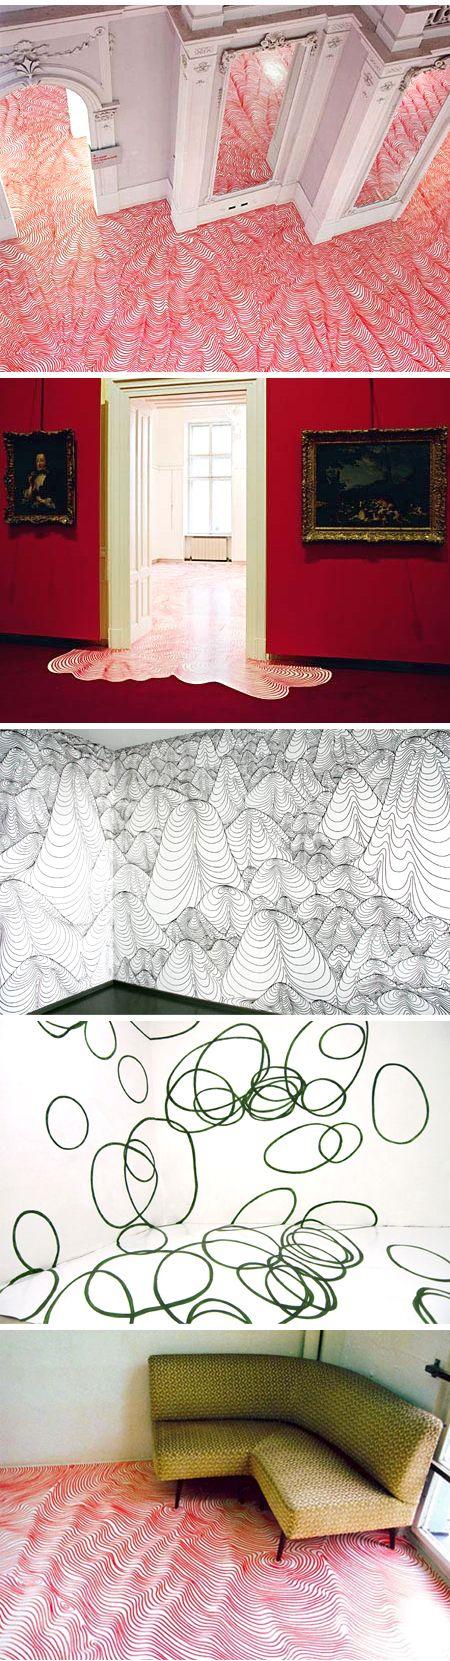 heike weber (floor, and wall, drawings)